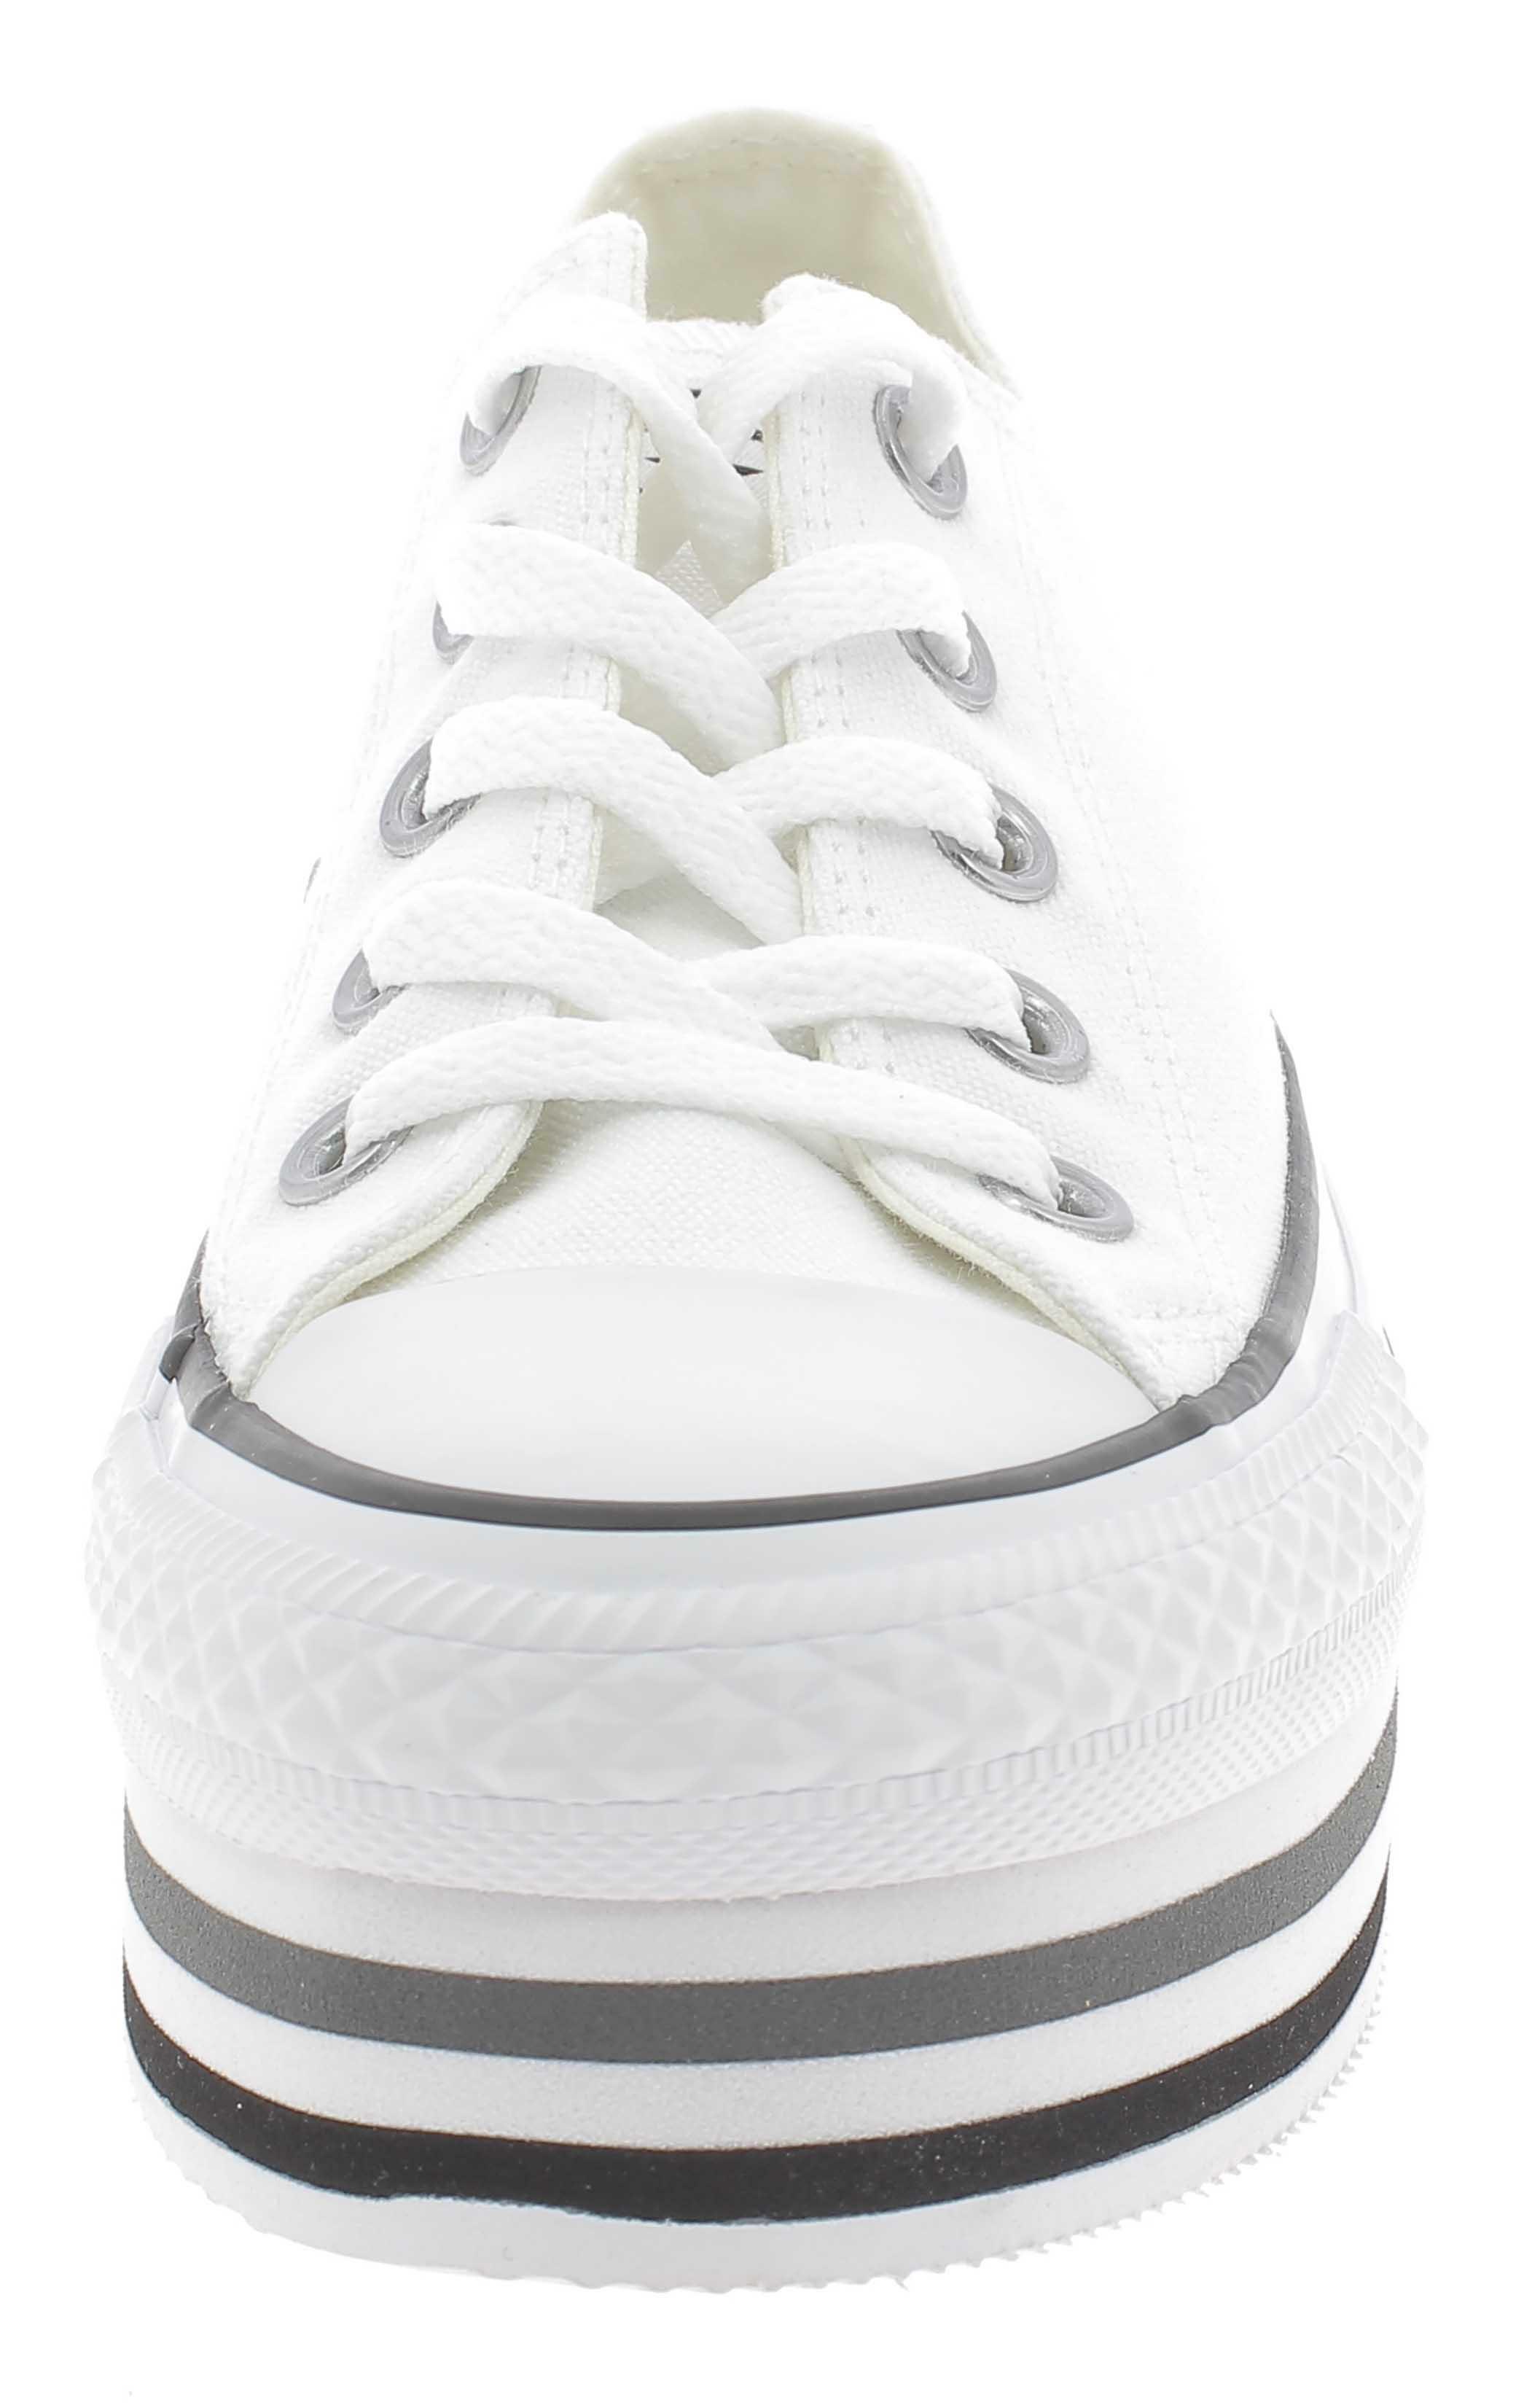 scarpe converse donna platform bianche in pelle